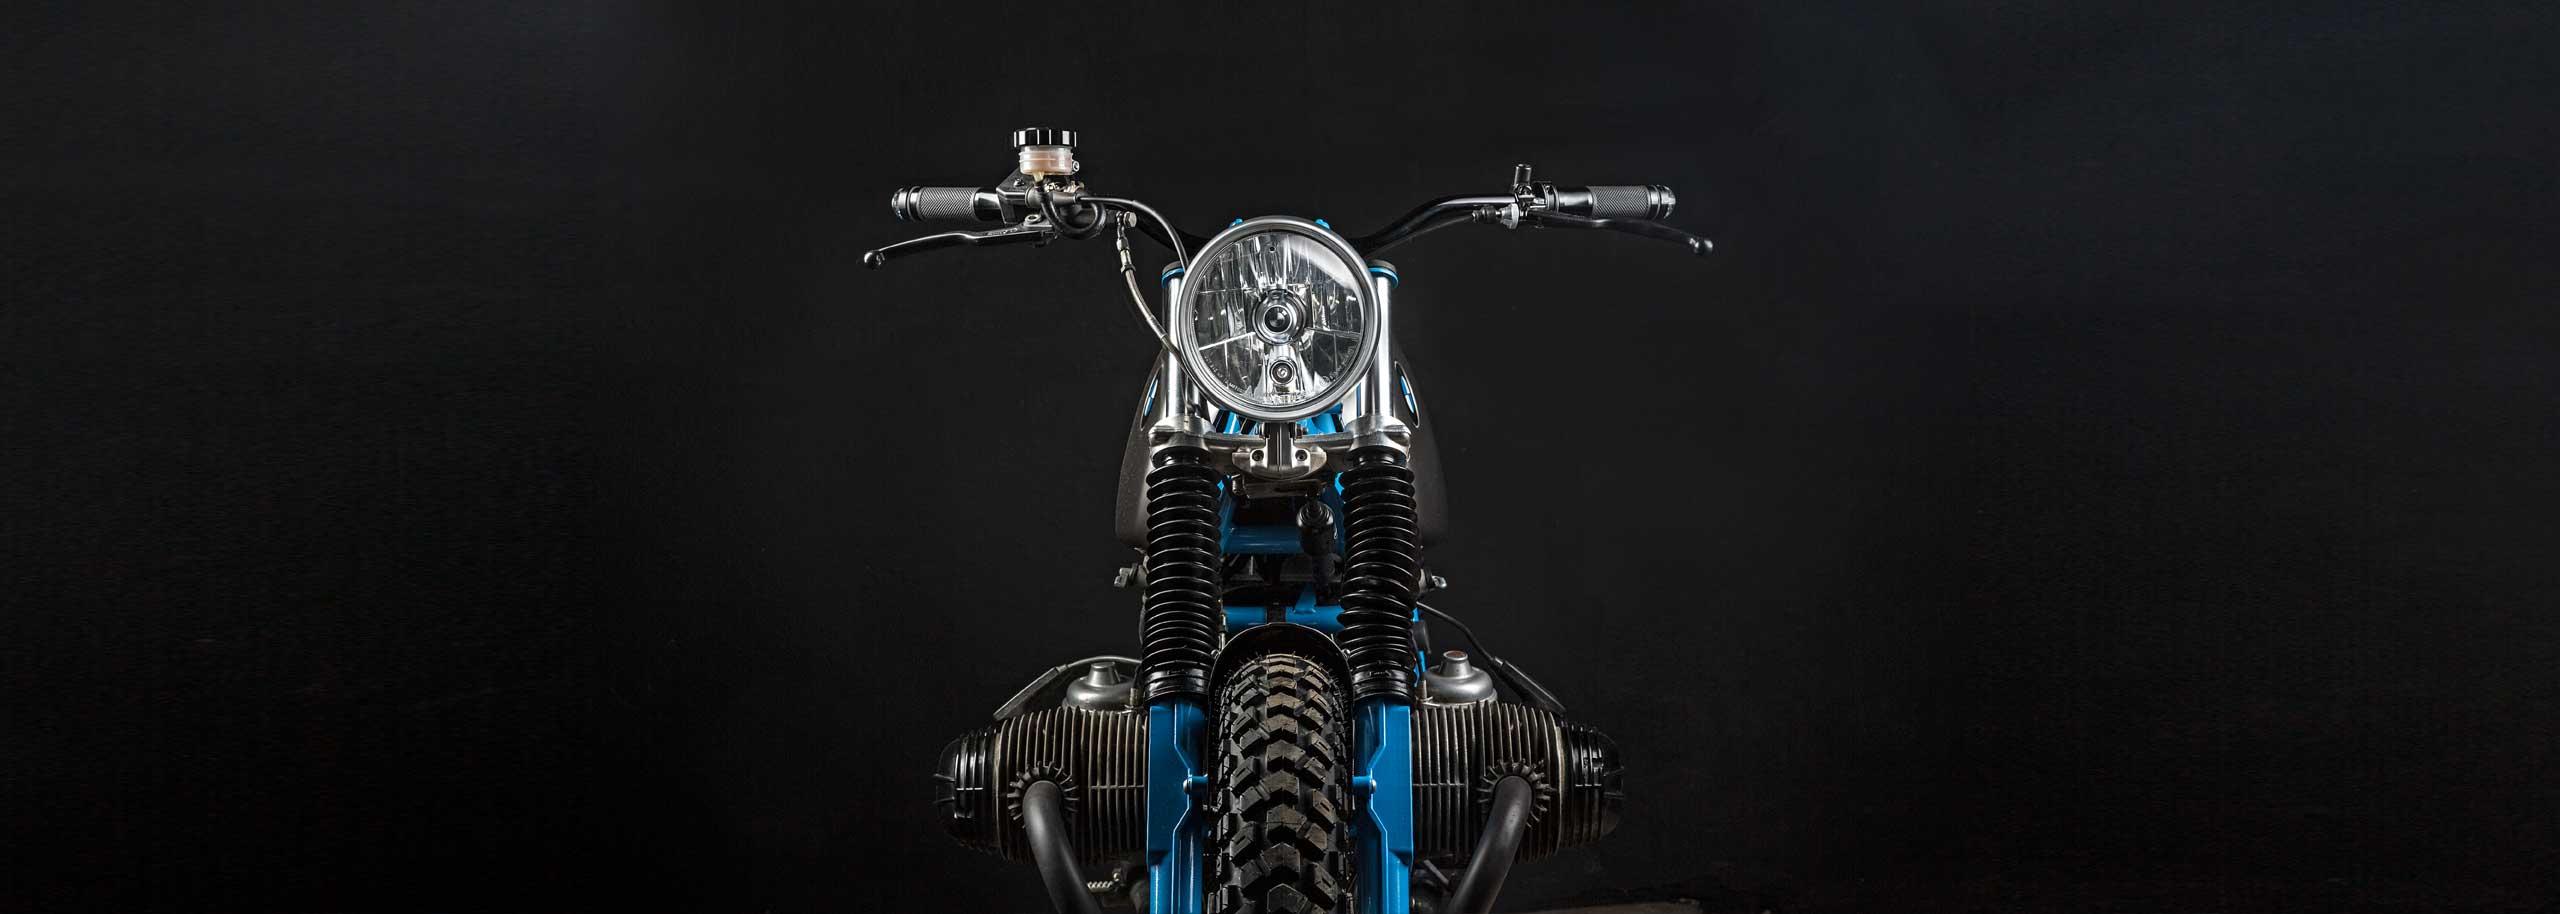 03_TITAN-PRATTER_BMW-R100-RS_Cafe-Racer-Graz-Motorrad-Umbau-Austria-Vintage_Custom_Kellermann_Motogadget_Rizoma_Brembo_LSL_Sebring